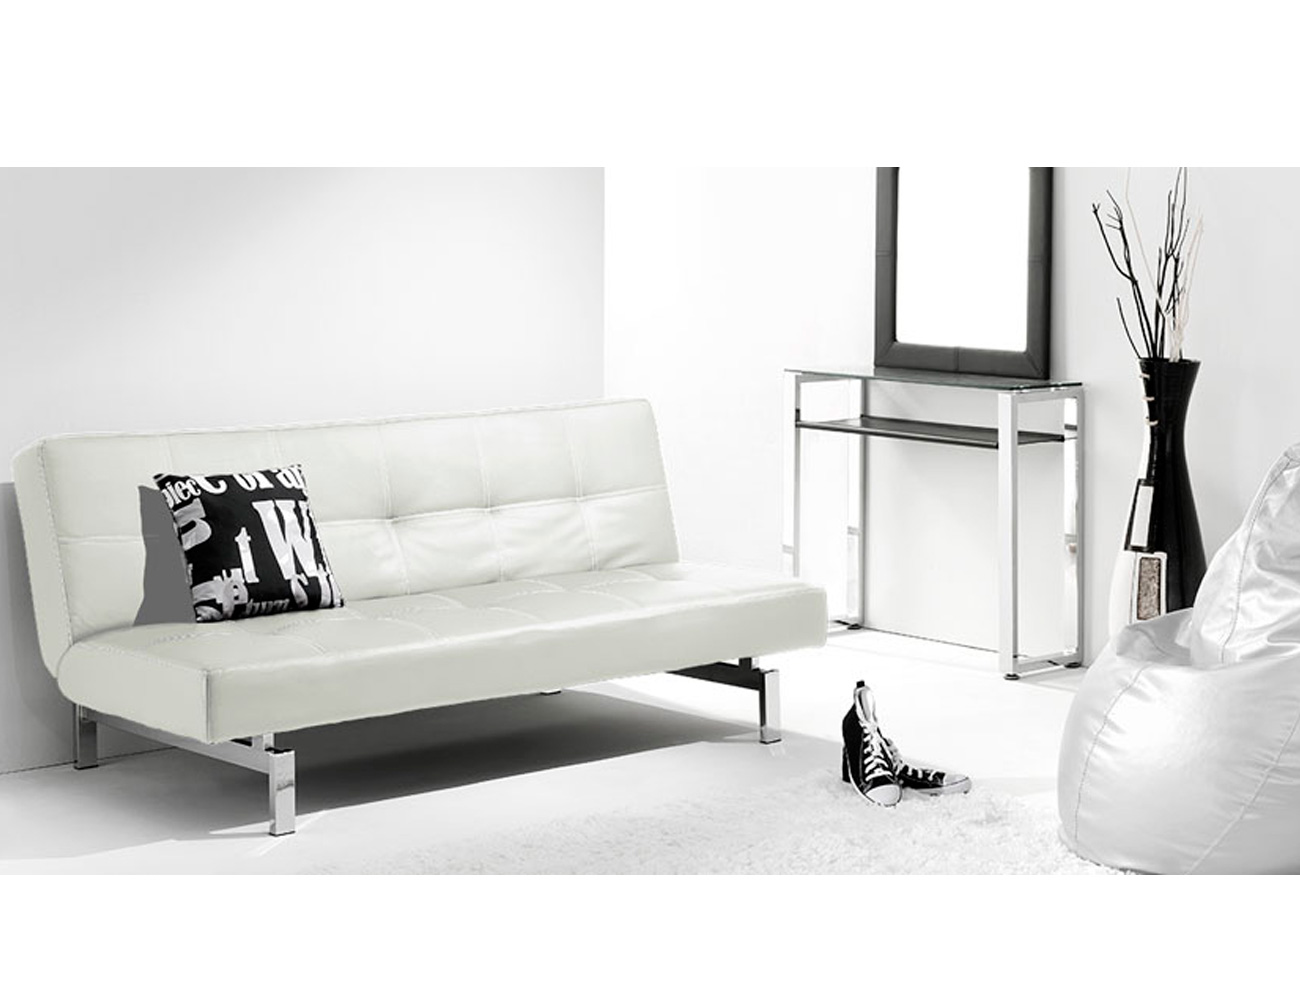 Sofa cama click clak blanco